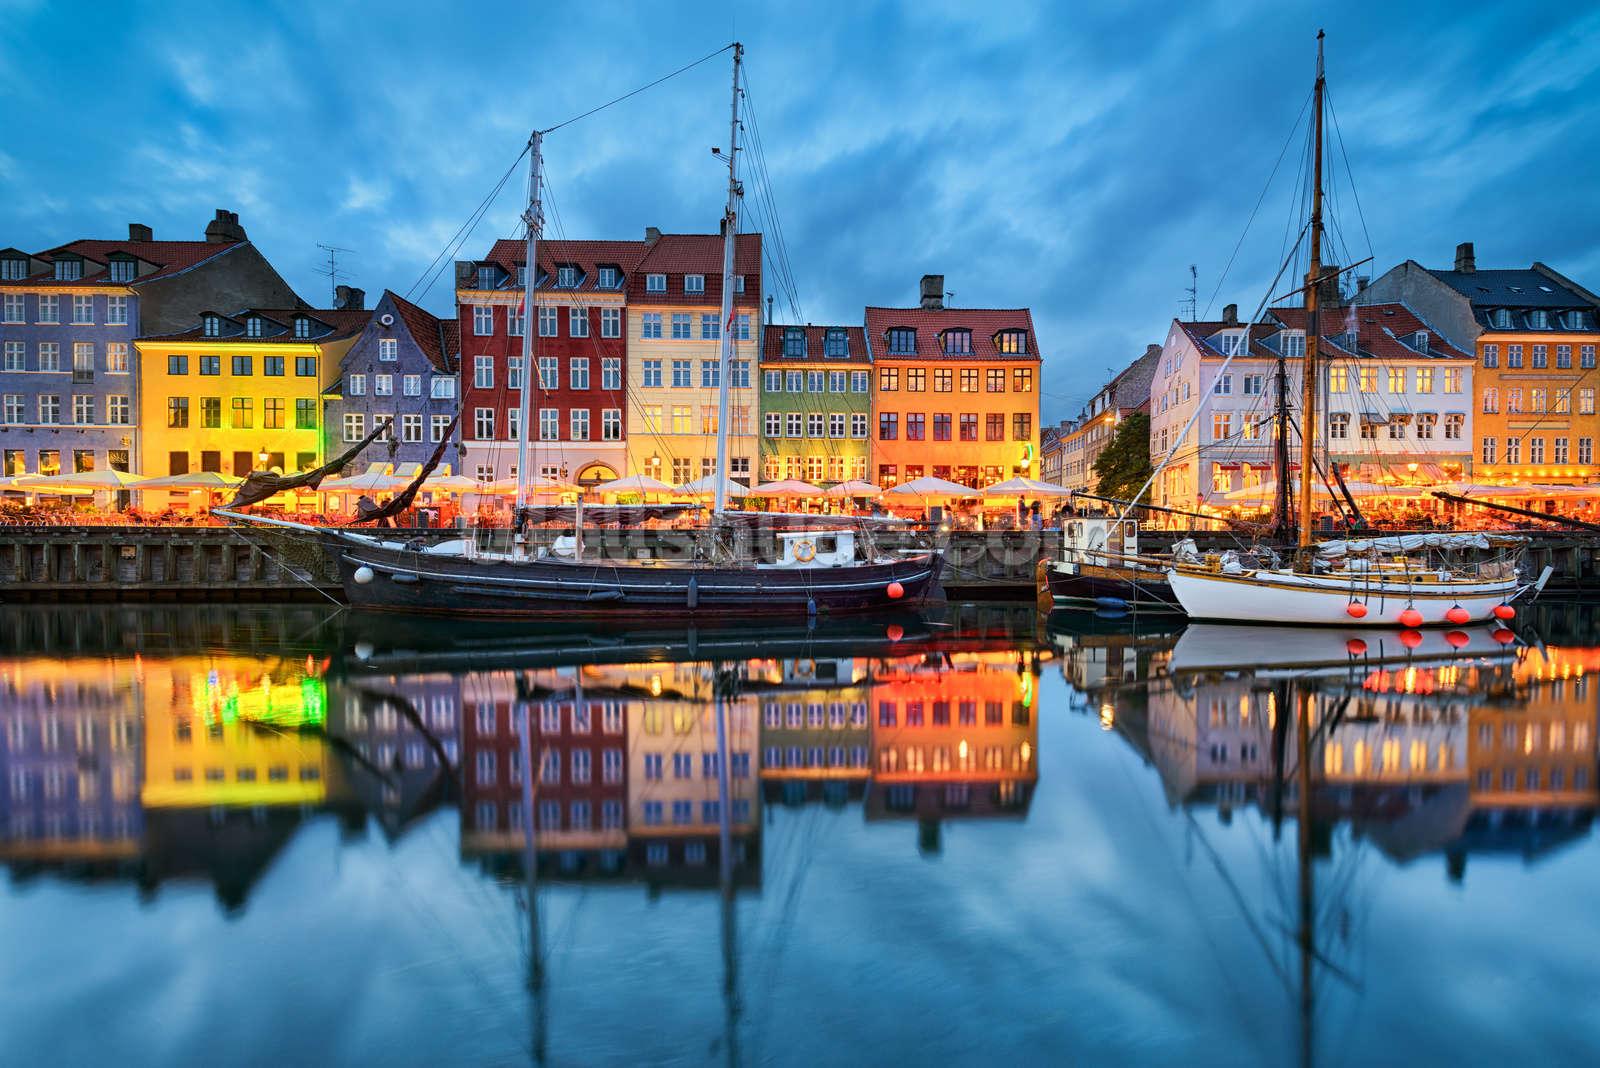 Beautiful nyhavn in copenhagen wall mural wallpaper wallsauce au - Copenhagen wallpaper ...